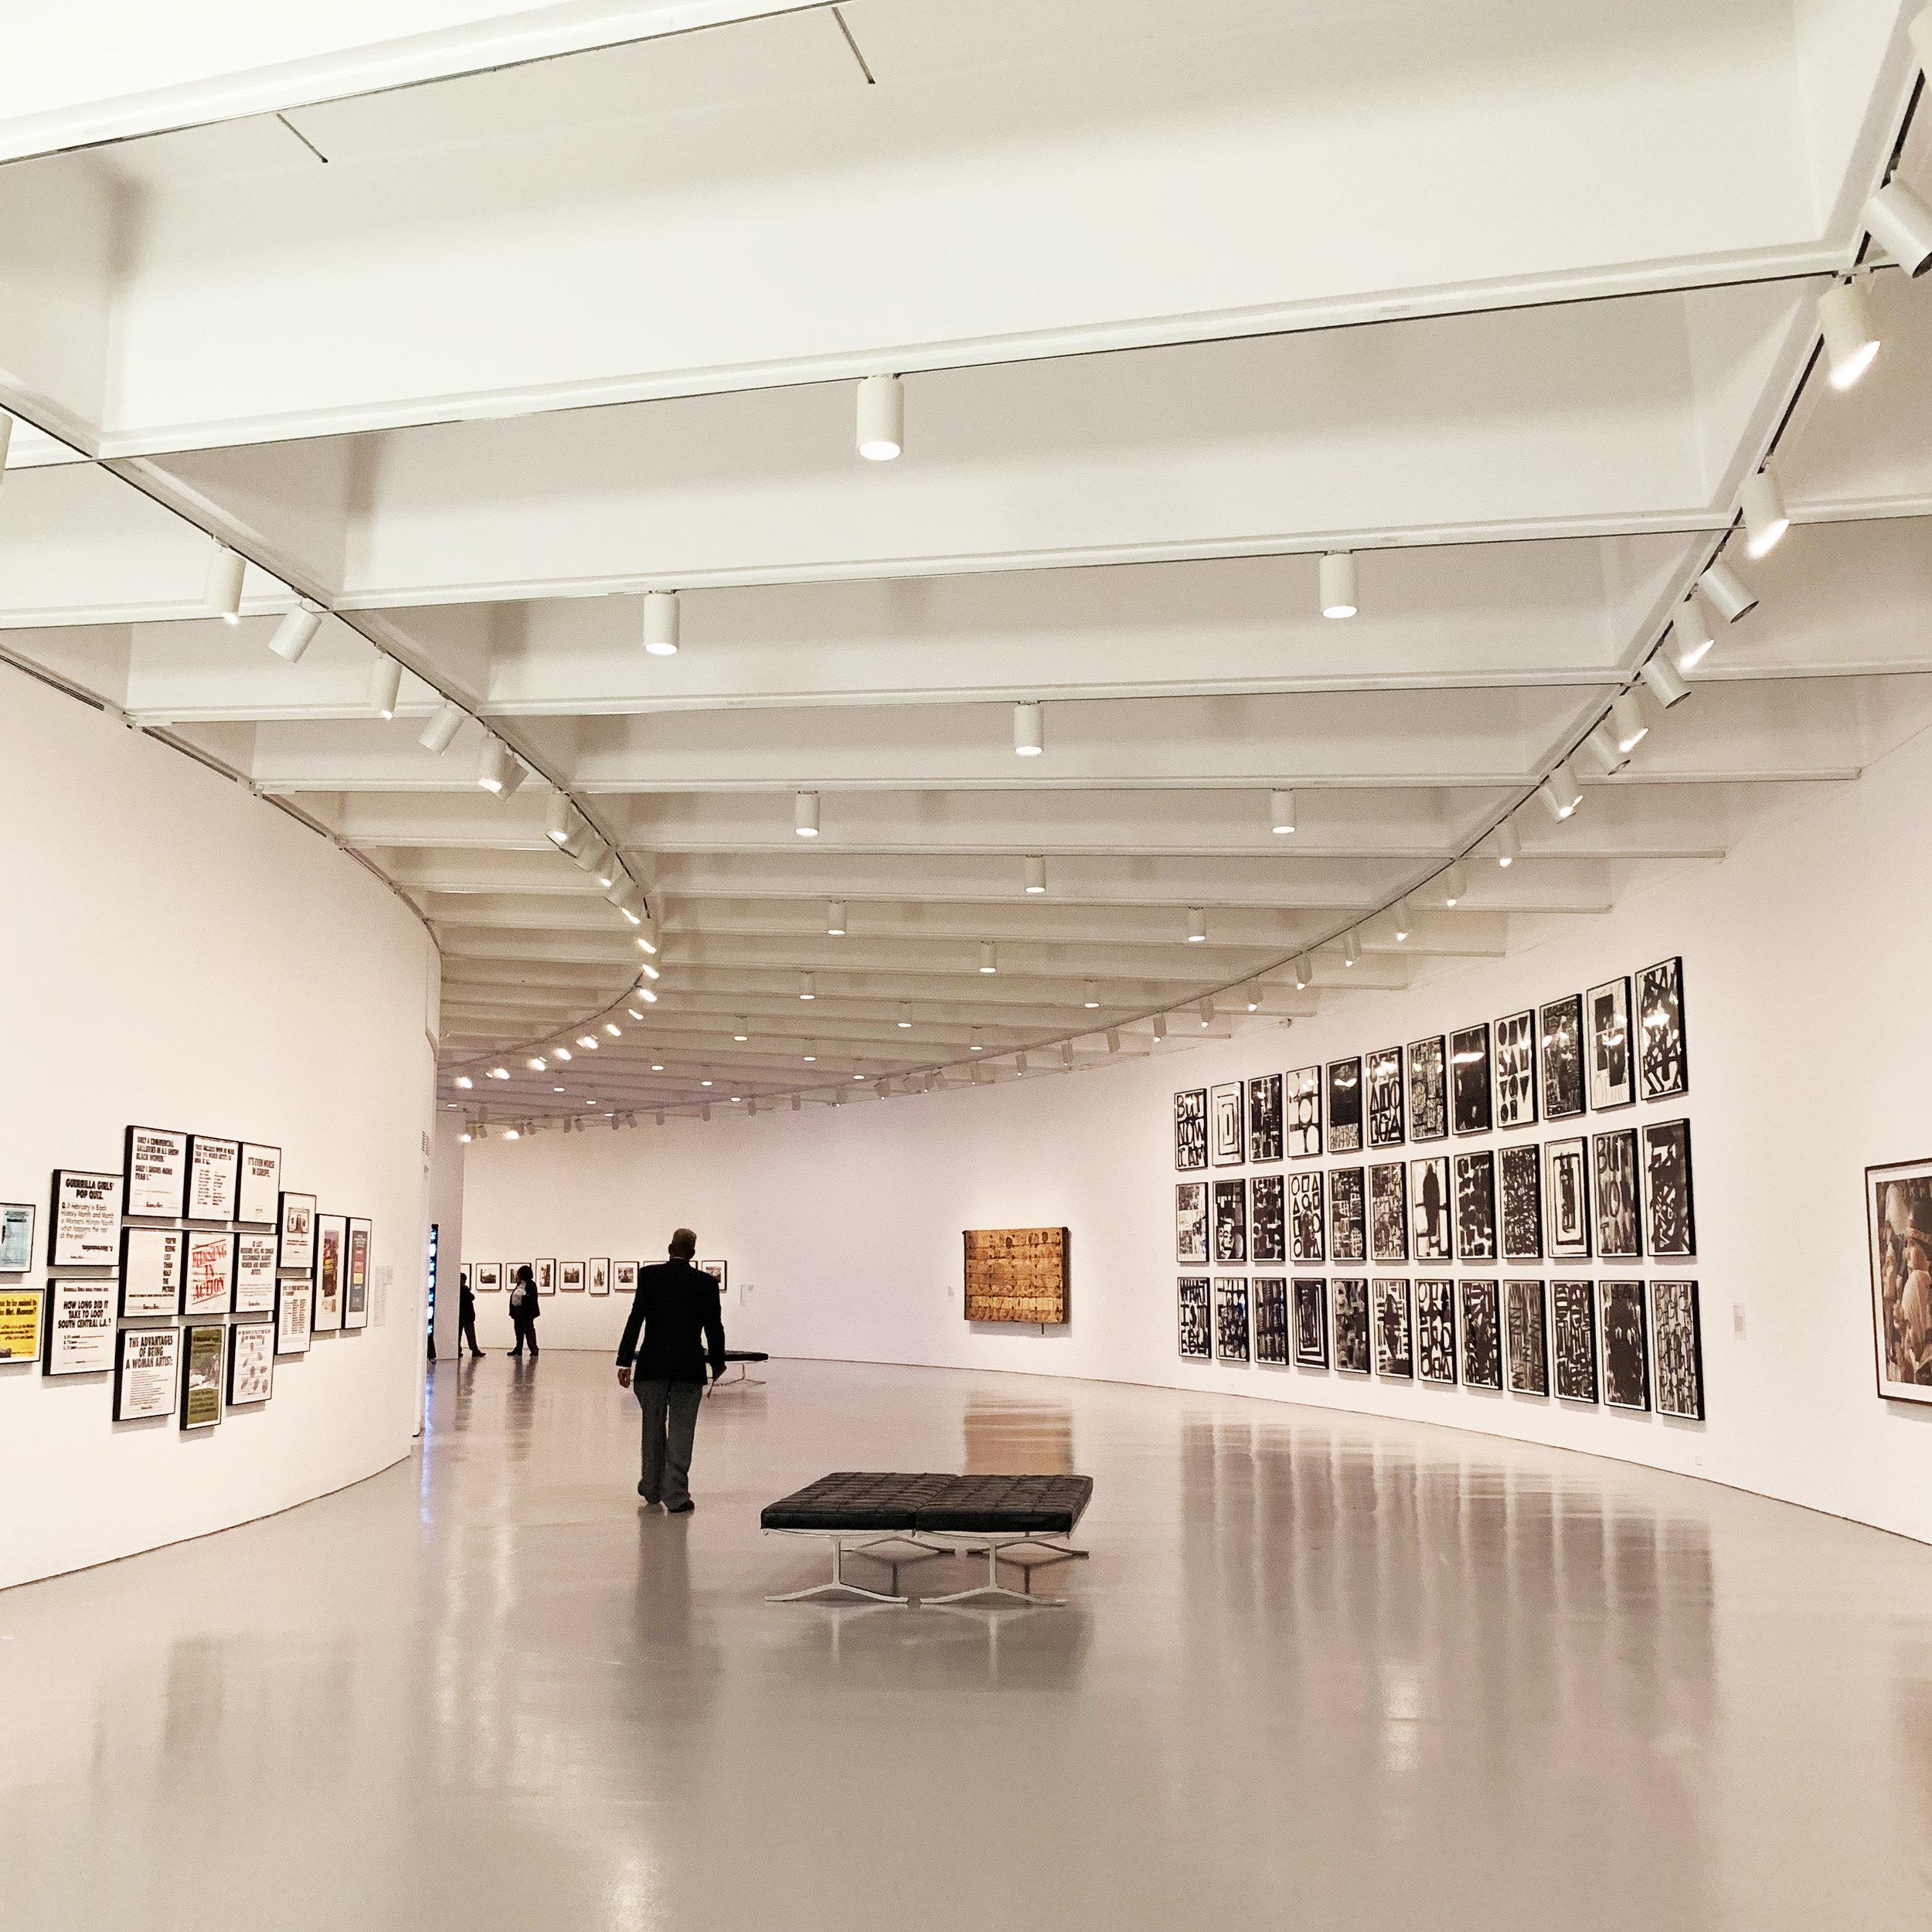 Circular galleries in the Hirshhorn Museum